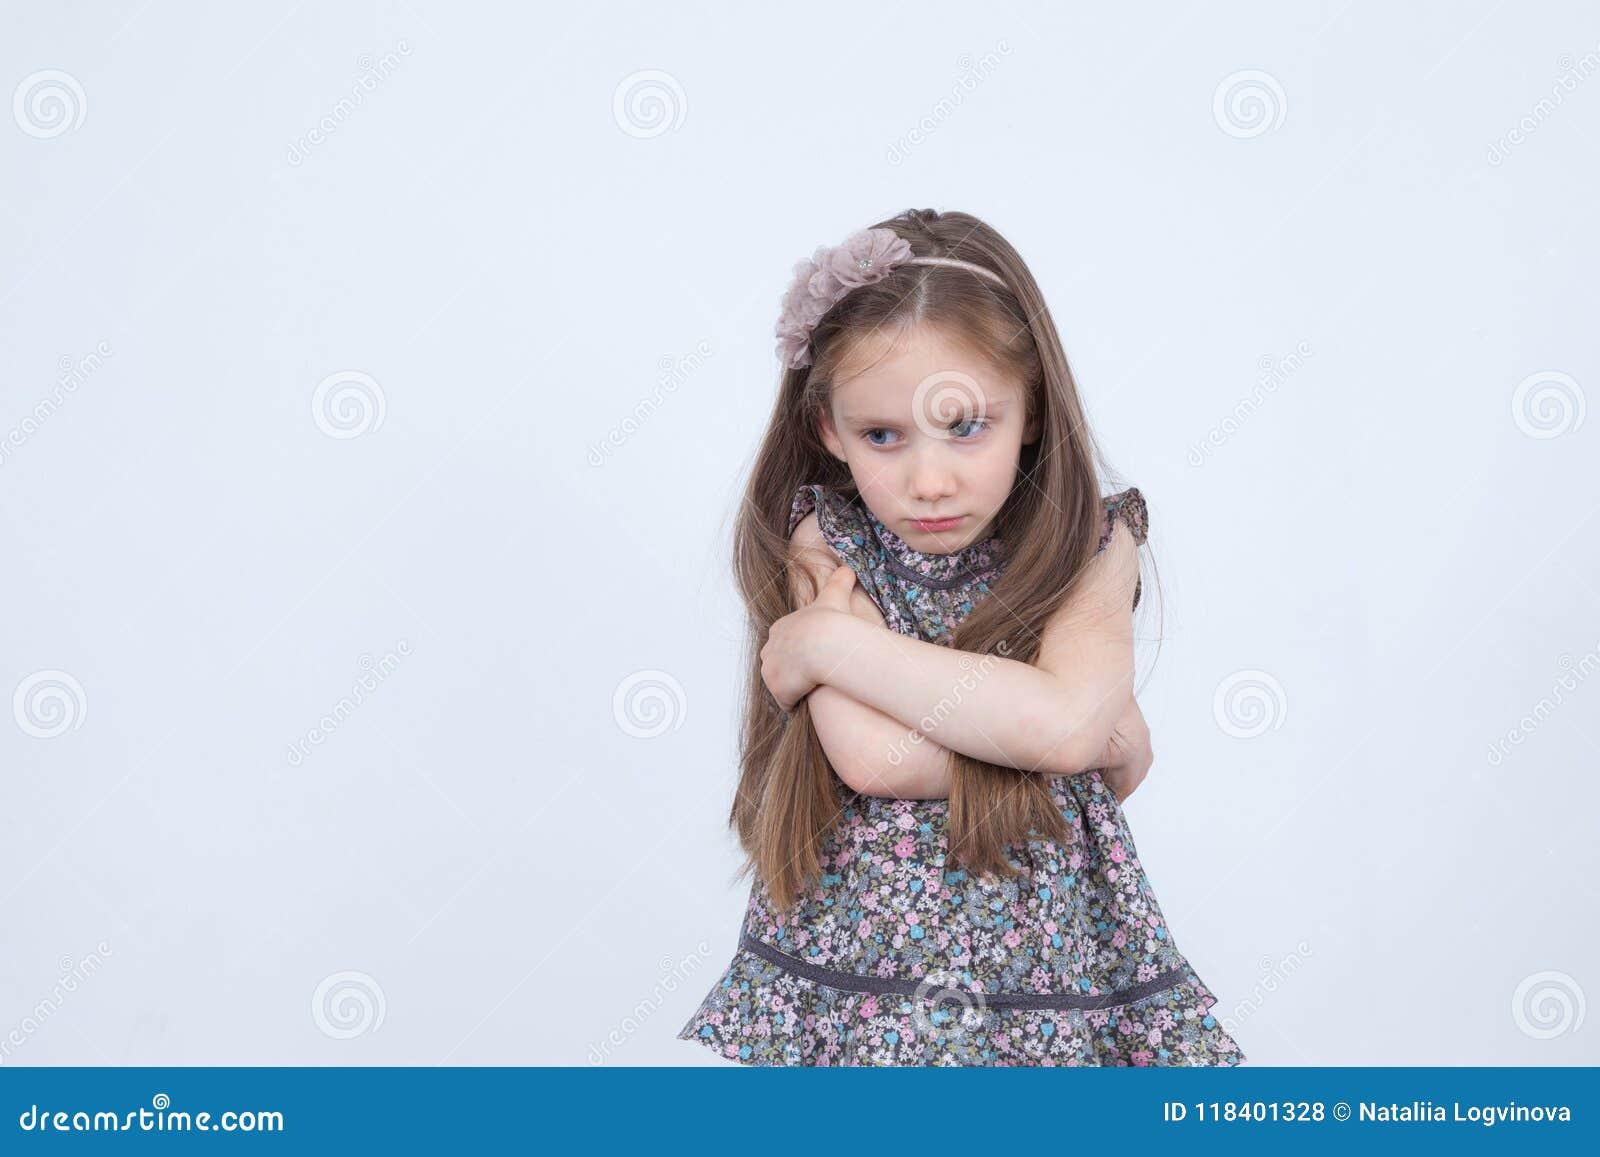 Meisje met verstoorde emotie Ongelukkig en verstoord kind Peuter in slechte stemming Emotioneel meisje Boze emoties